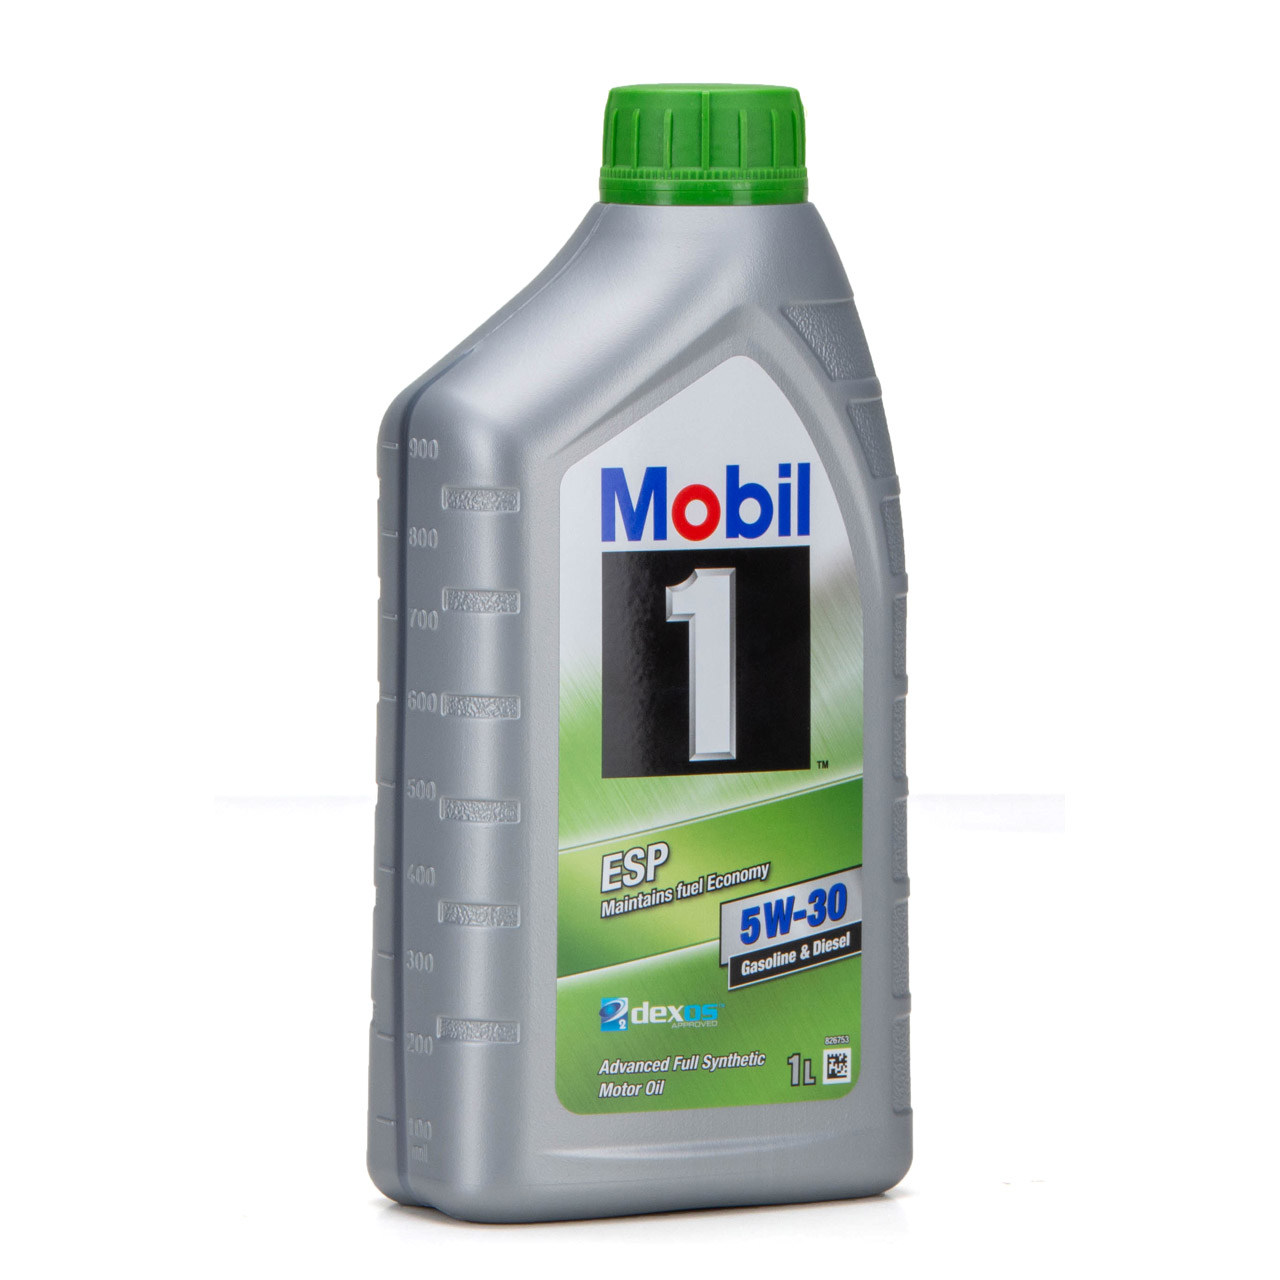 Mobil 1 ESP Motoröl Öl 5W-30 5W30 dexos2 PORSCHE C30 VW 504.00/507.00 - 1 Liter